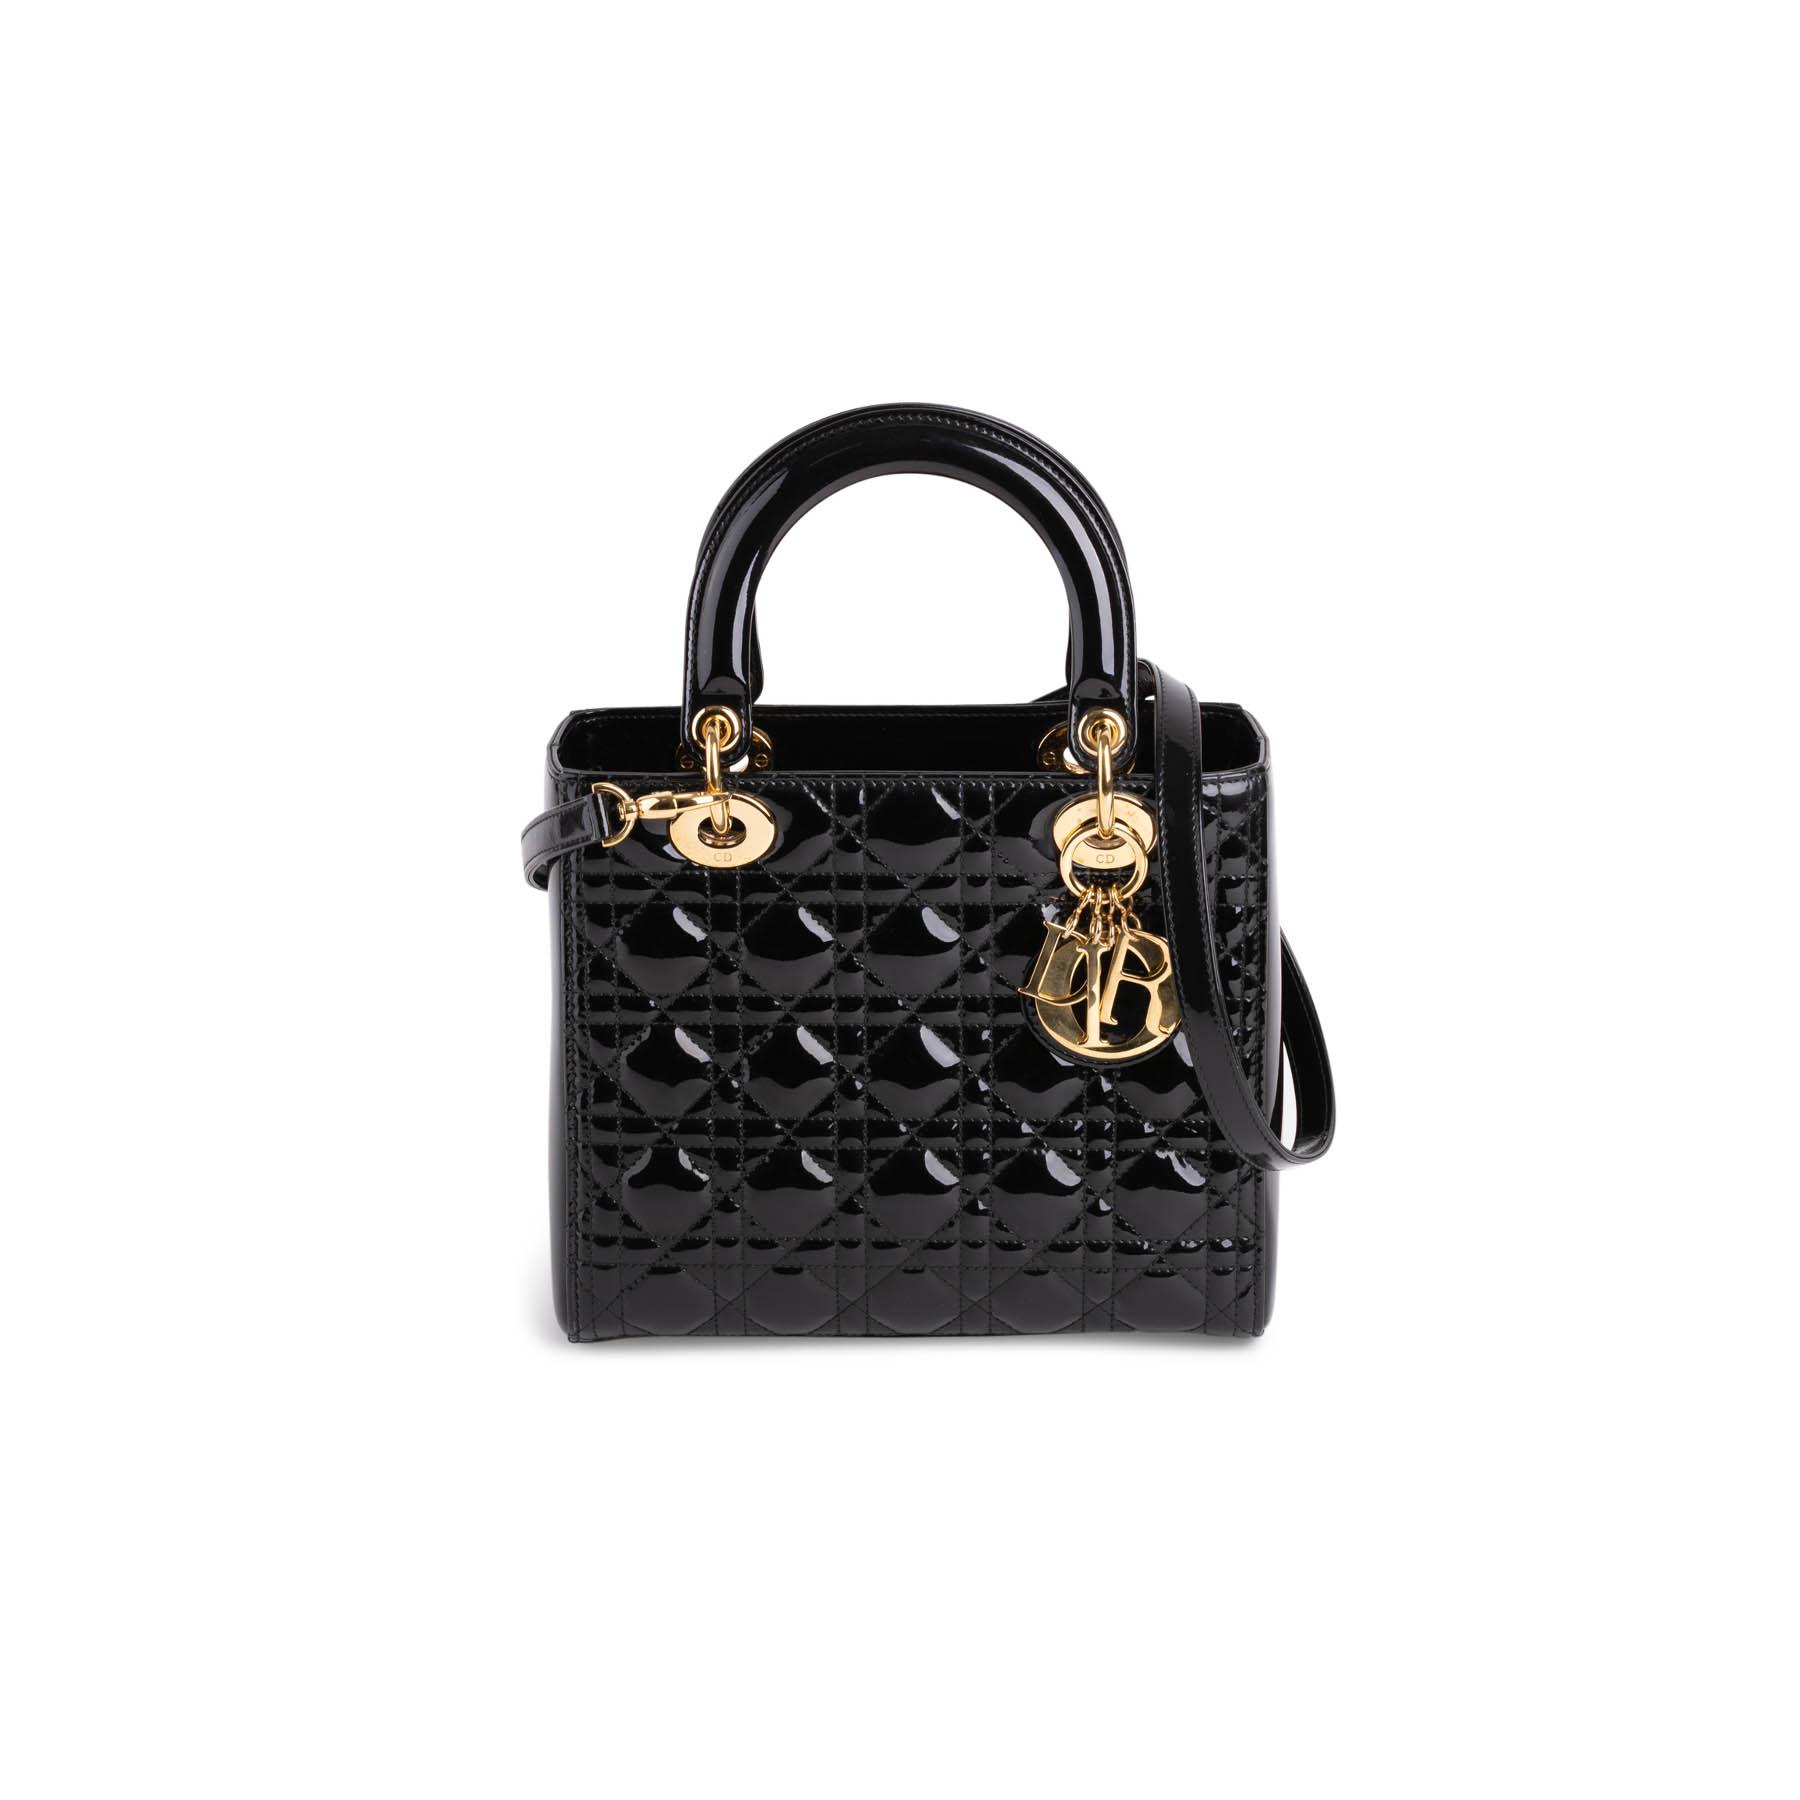 b956c392 Lady Dior Patent Leather Bag